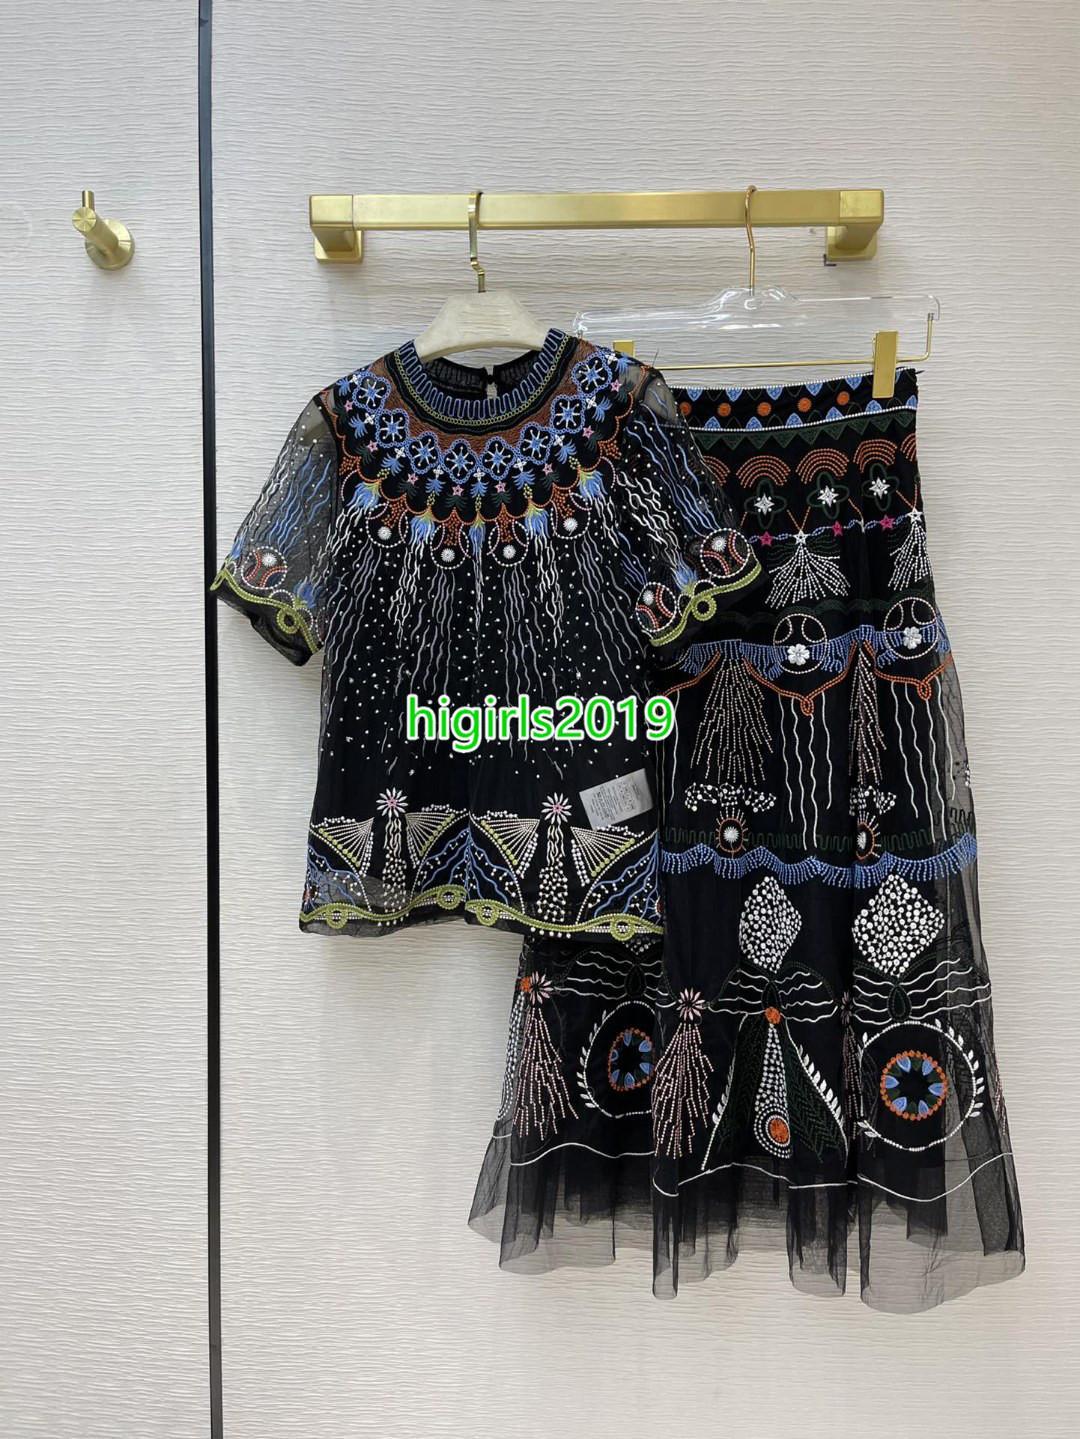 Mujeres niñas camiseta de manga corta camiseta de tul tul tees con tops bordados florales t-shirt retro camiseta alta cintura midi malla falda vestido de dos piezas